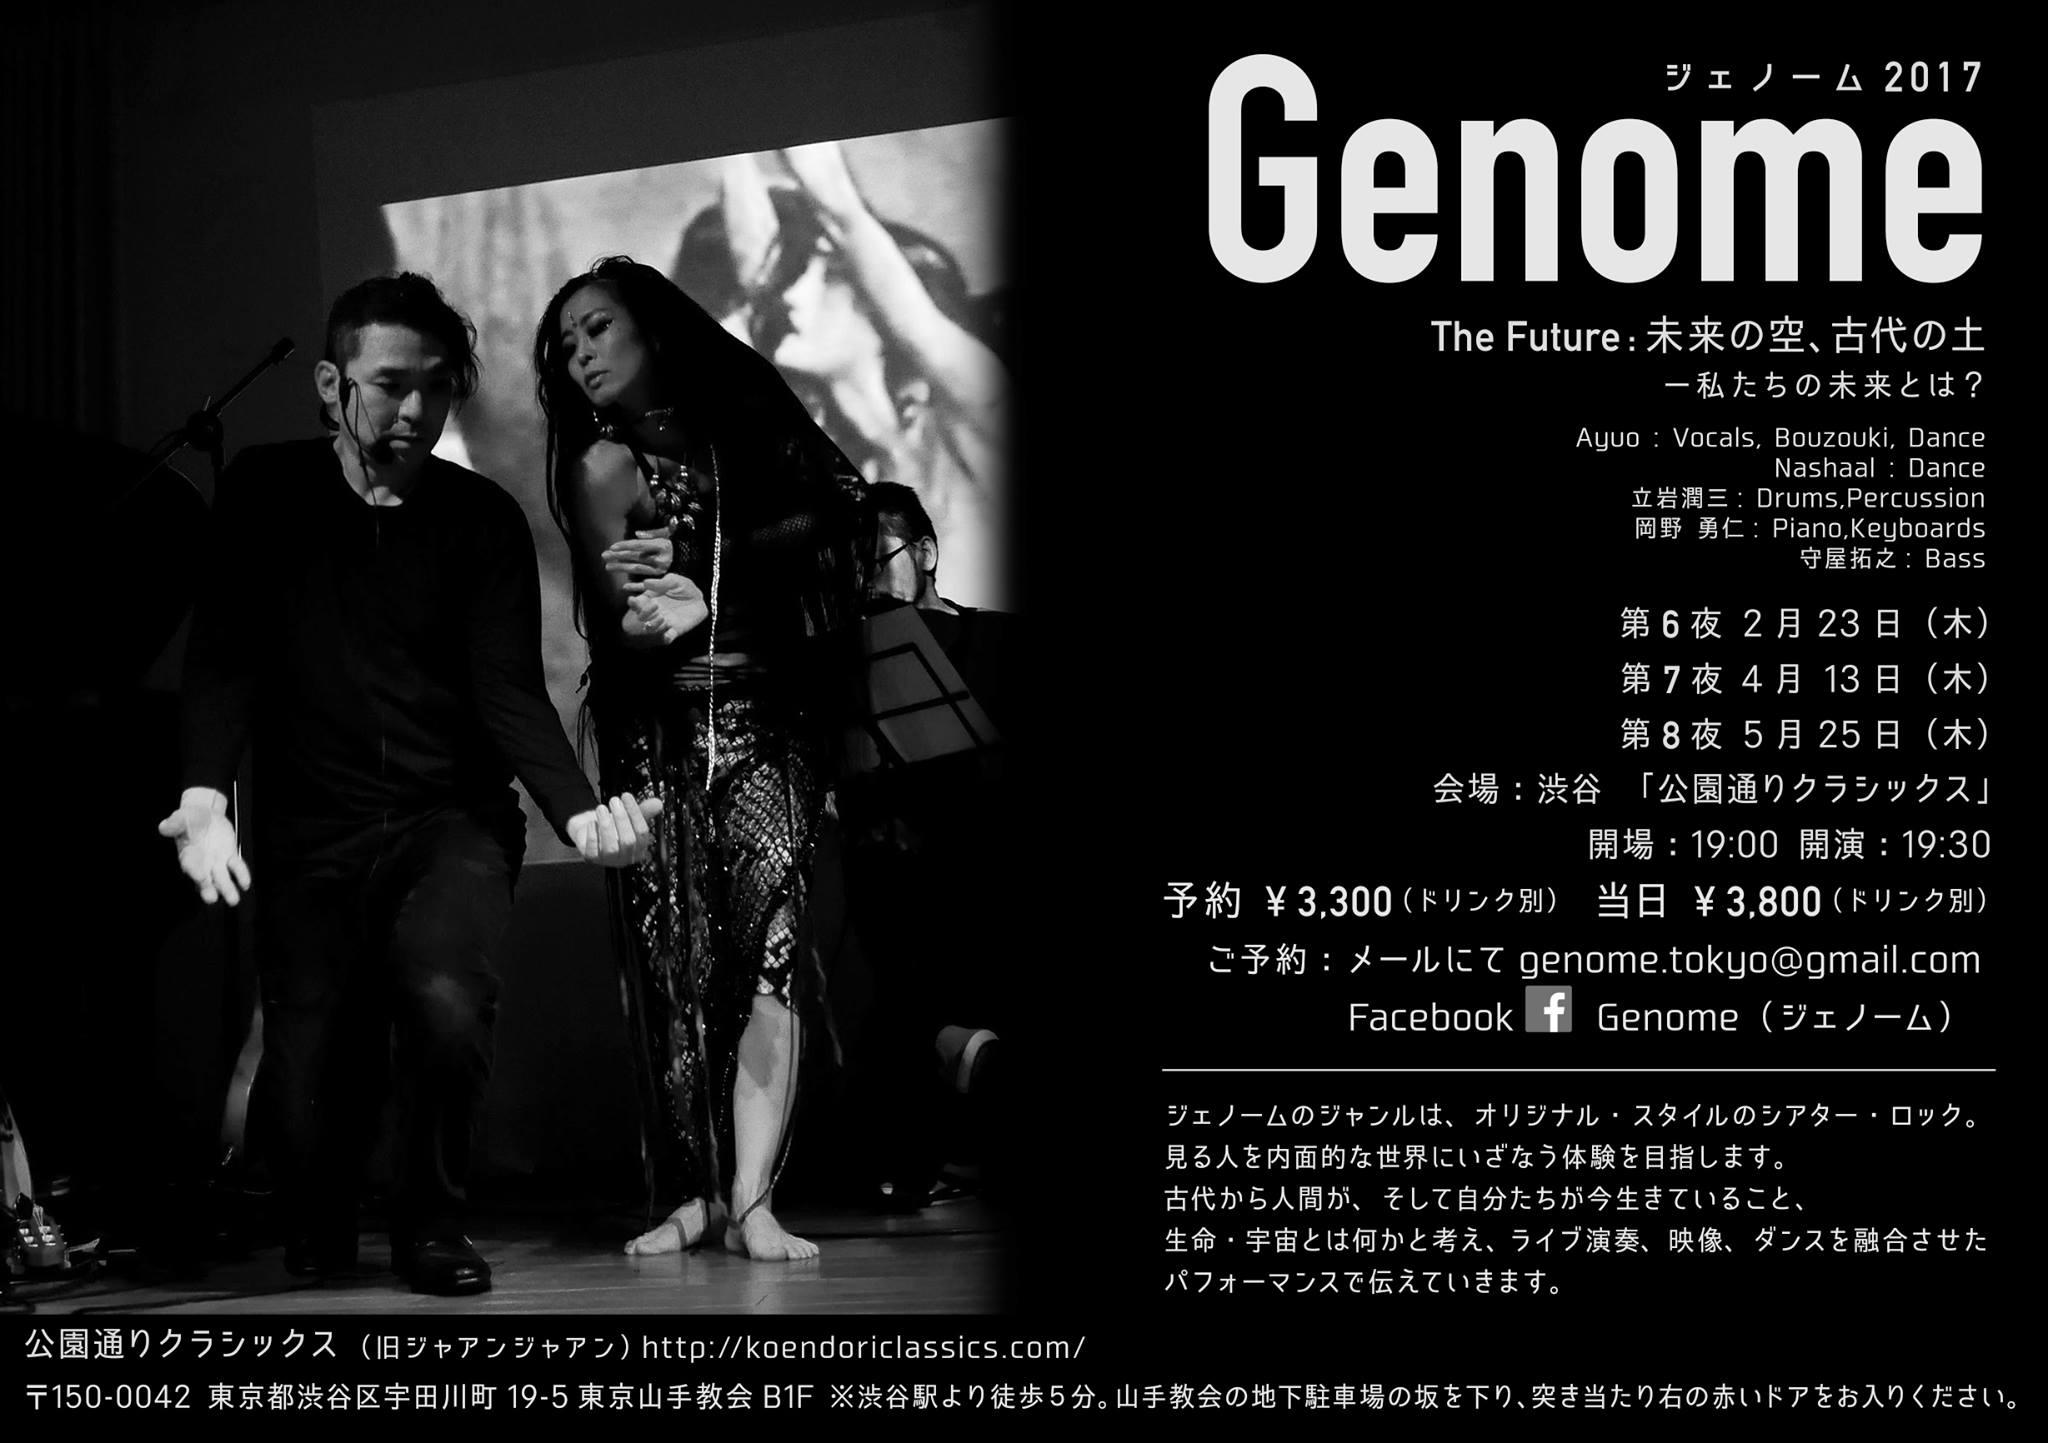 GENOME/The Future:未来の空、古代の土 ー私たちの未来とは?